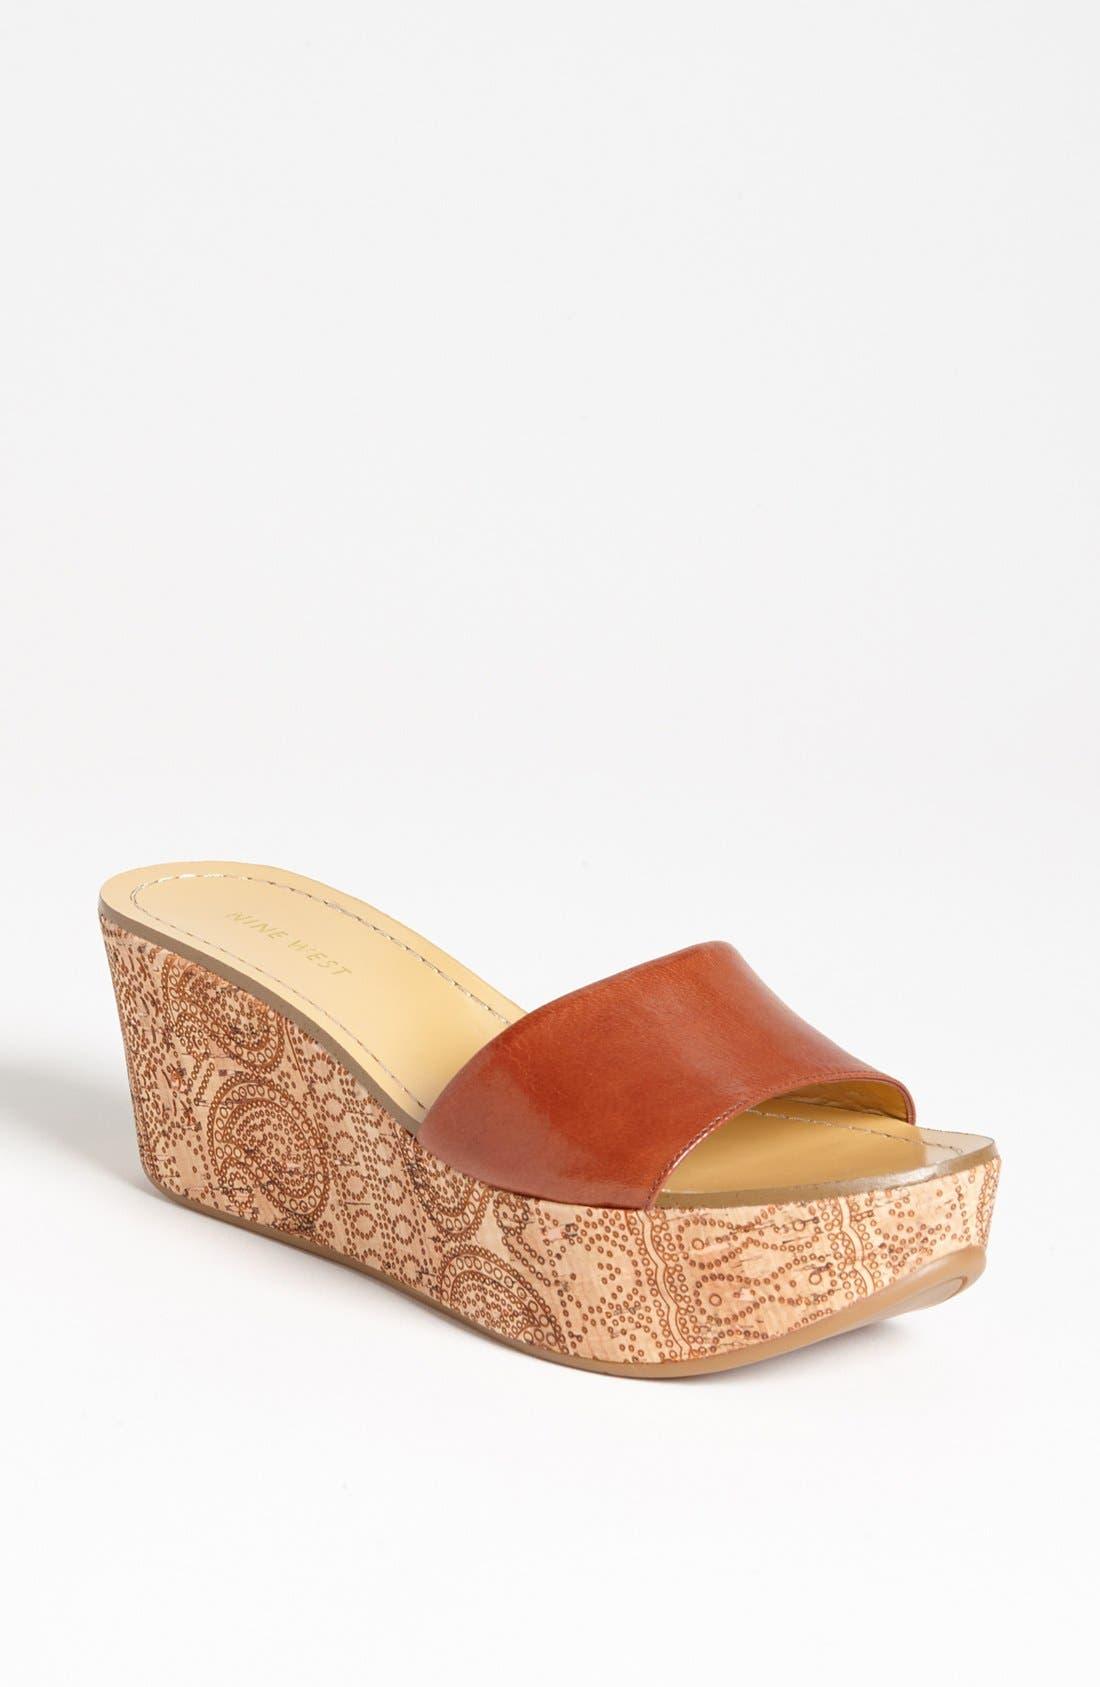 Main Image - Nine West 'Relax' Sandal